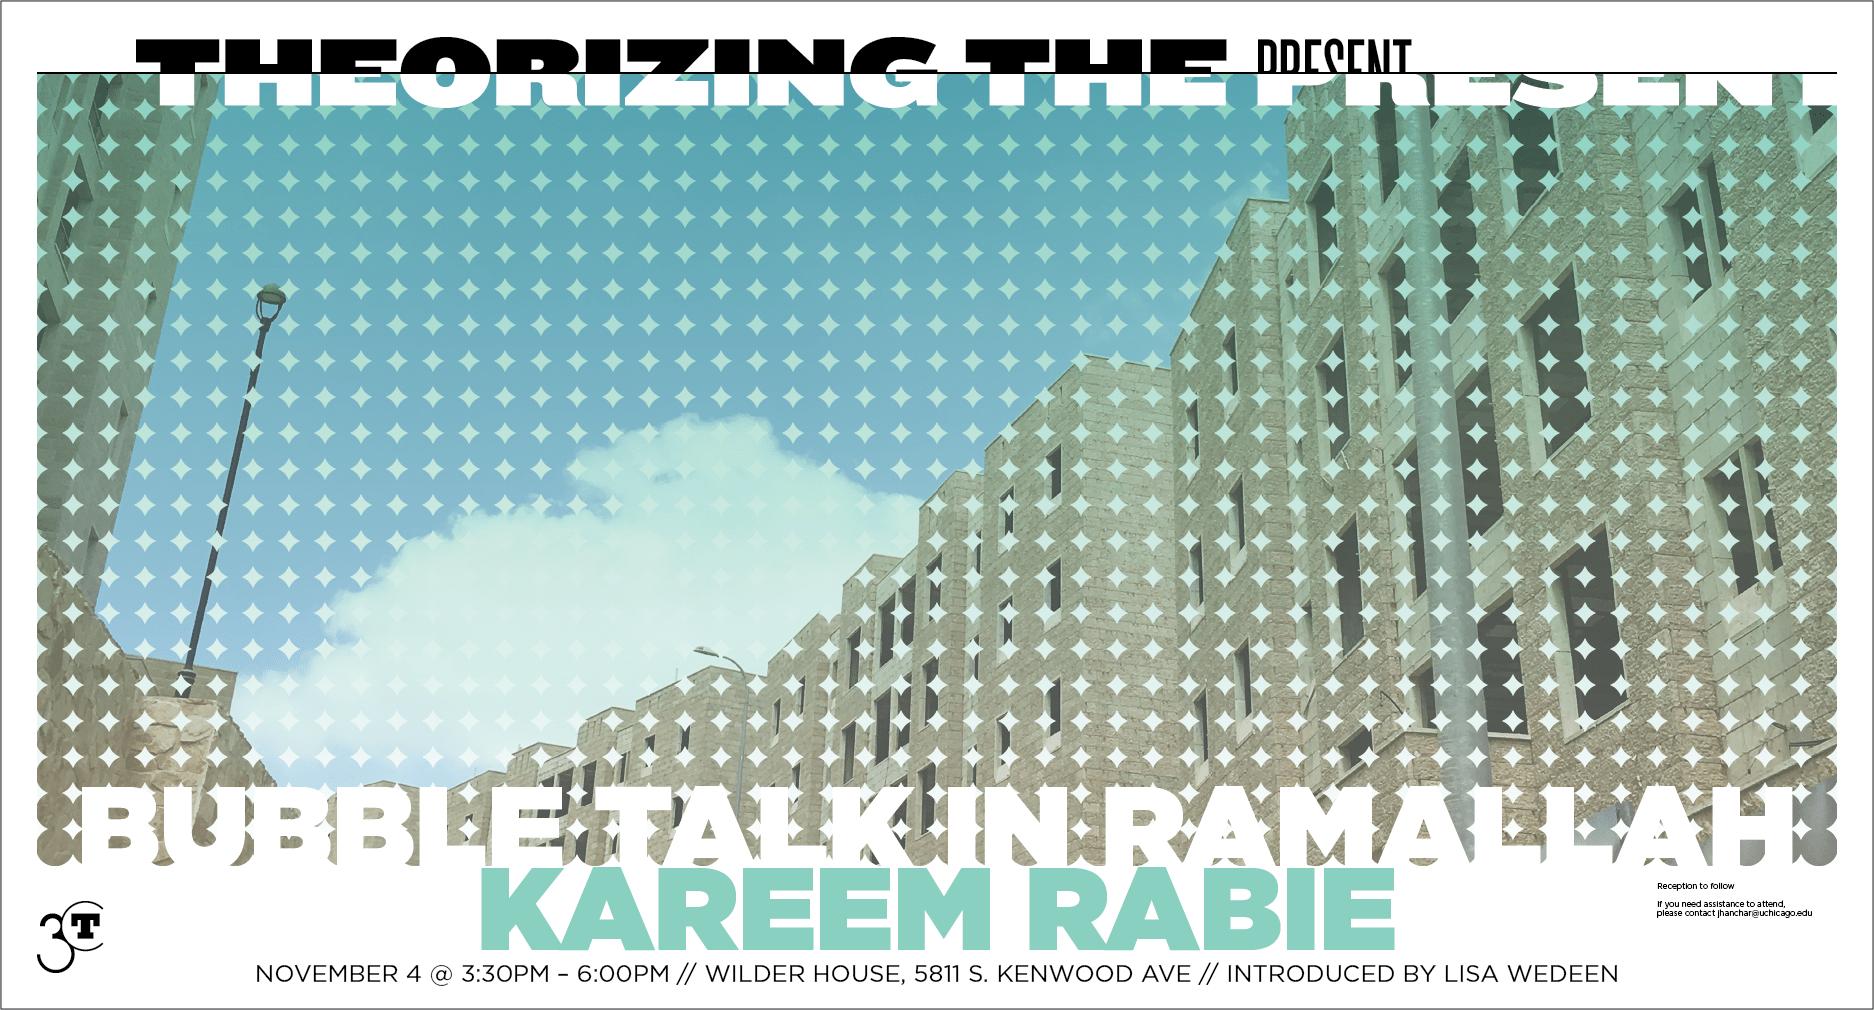 Kareem Rabie event poster for Bubble Talk in Ramallah